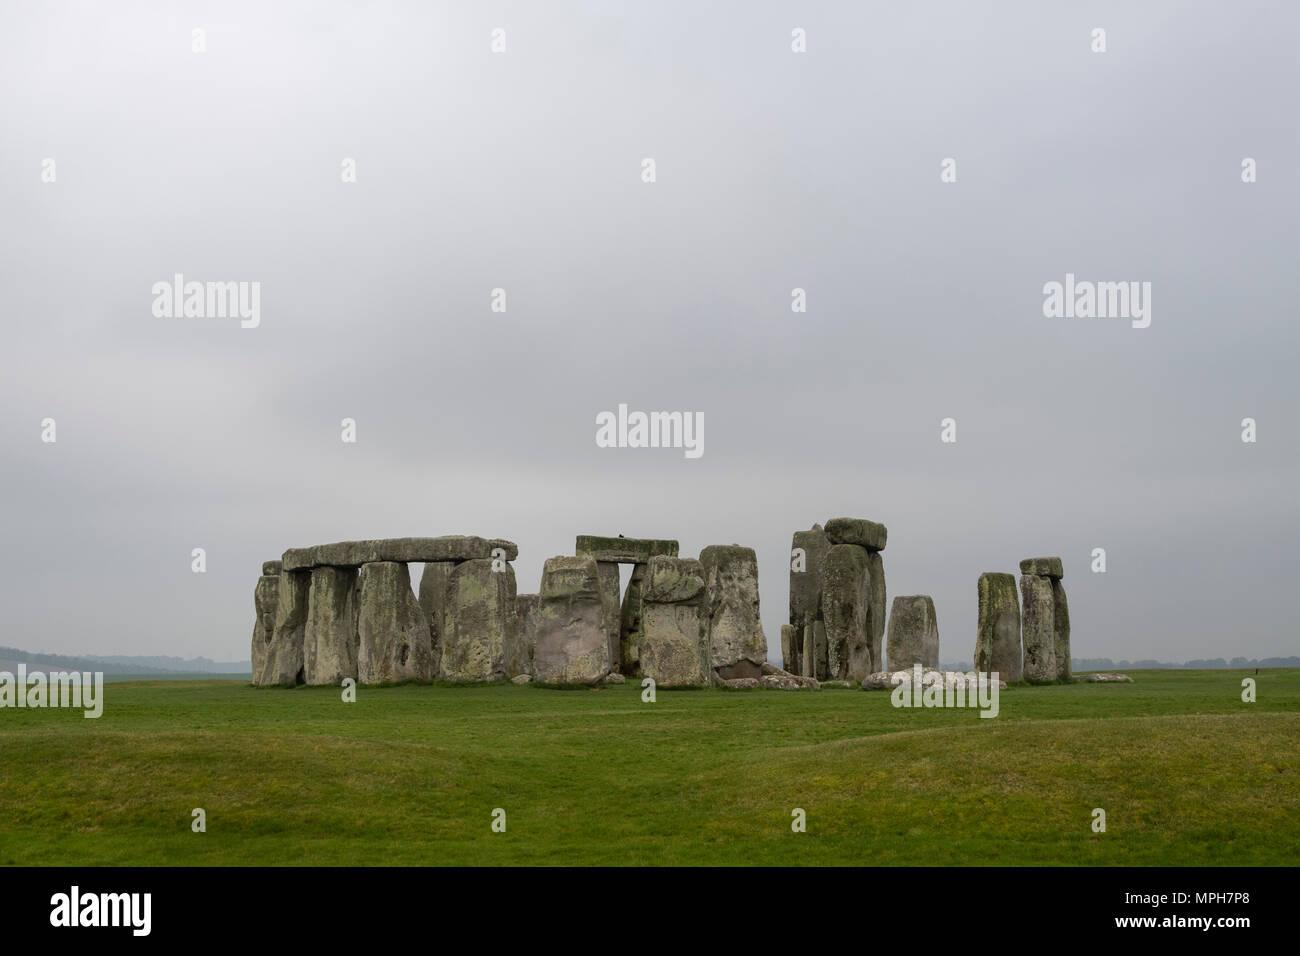 Stonehenge, prähistorischer Steinkreis - Stock Image